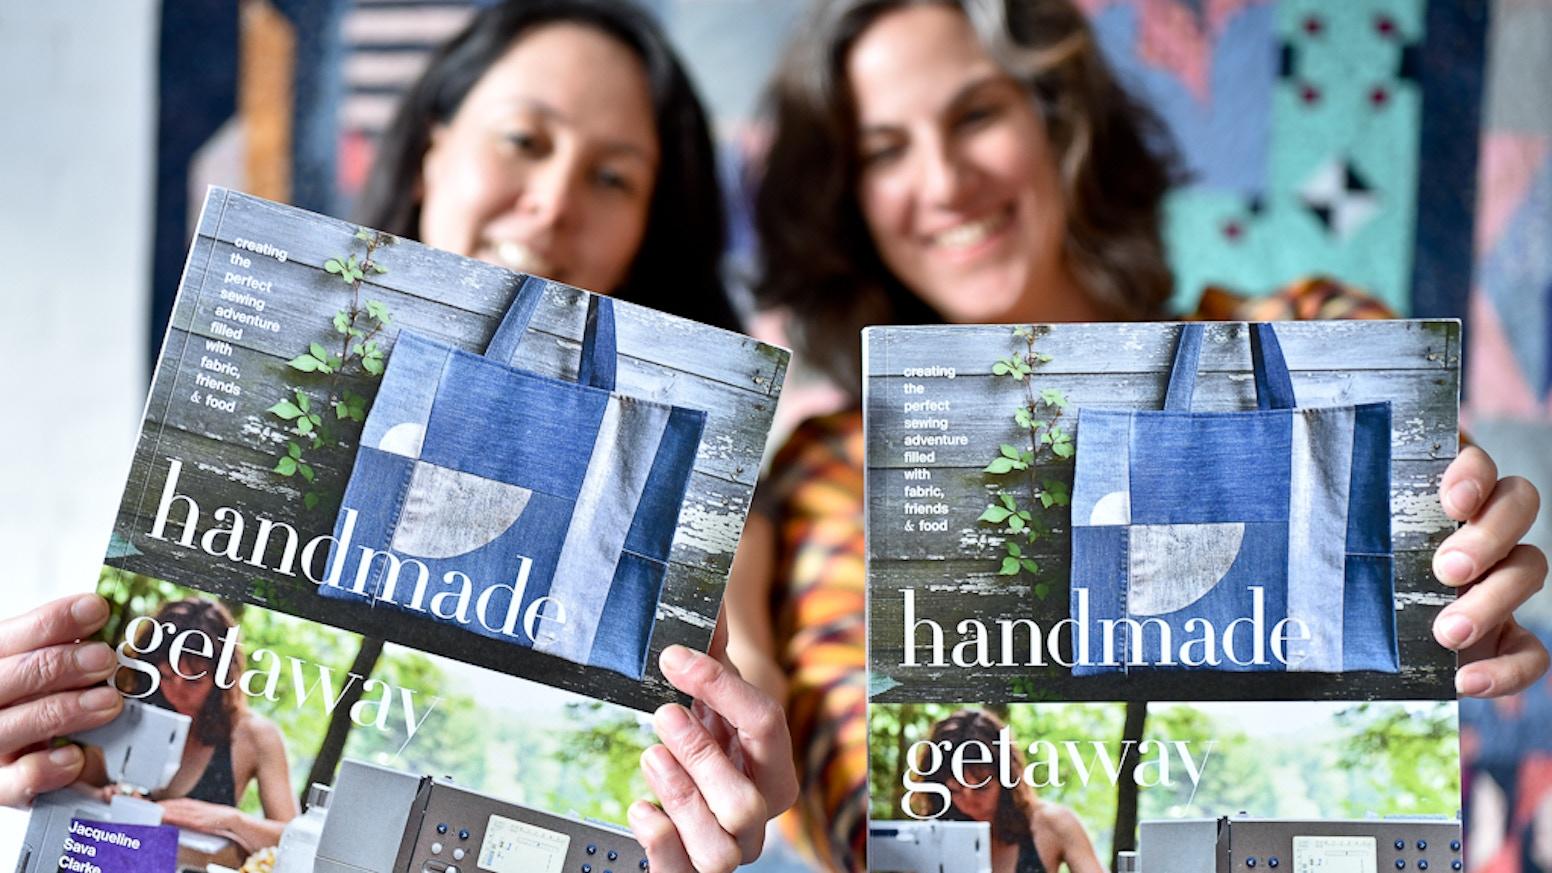 Handmade Getaway, a book by Karyn Valino & Jacqueline Sava